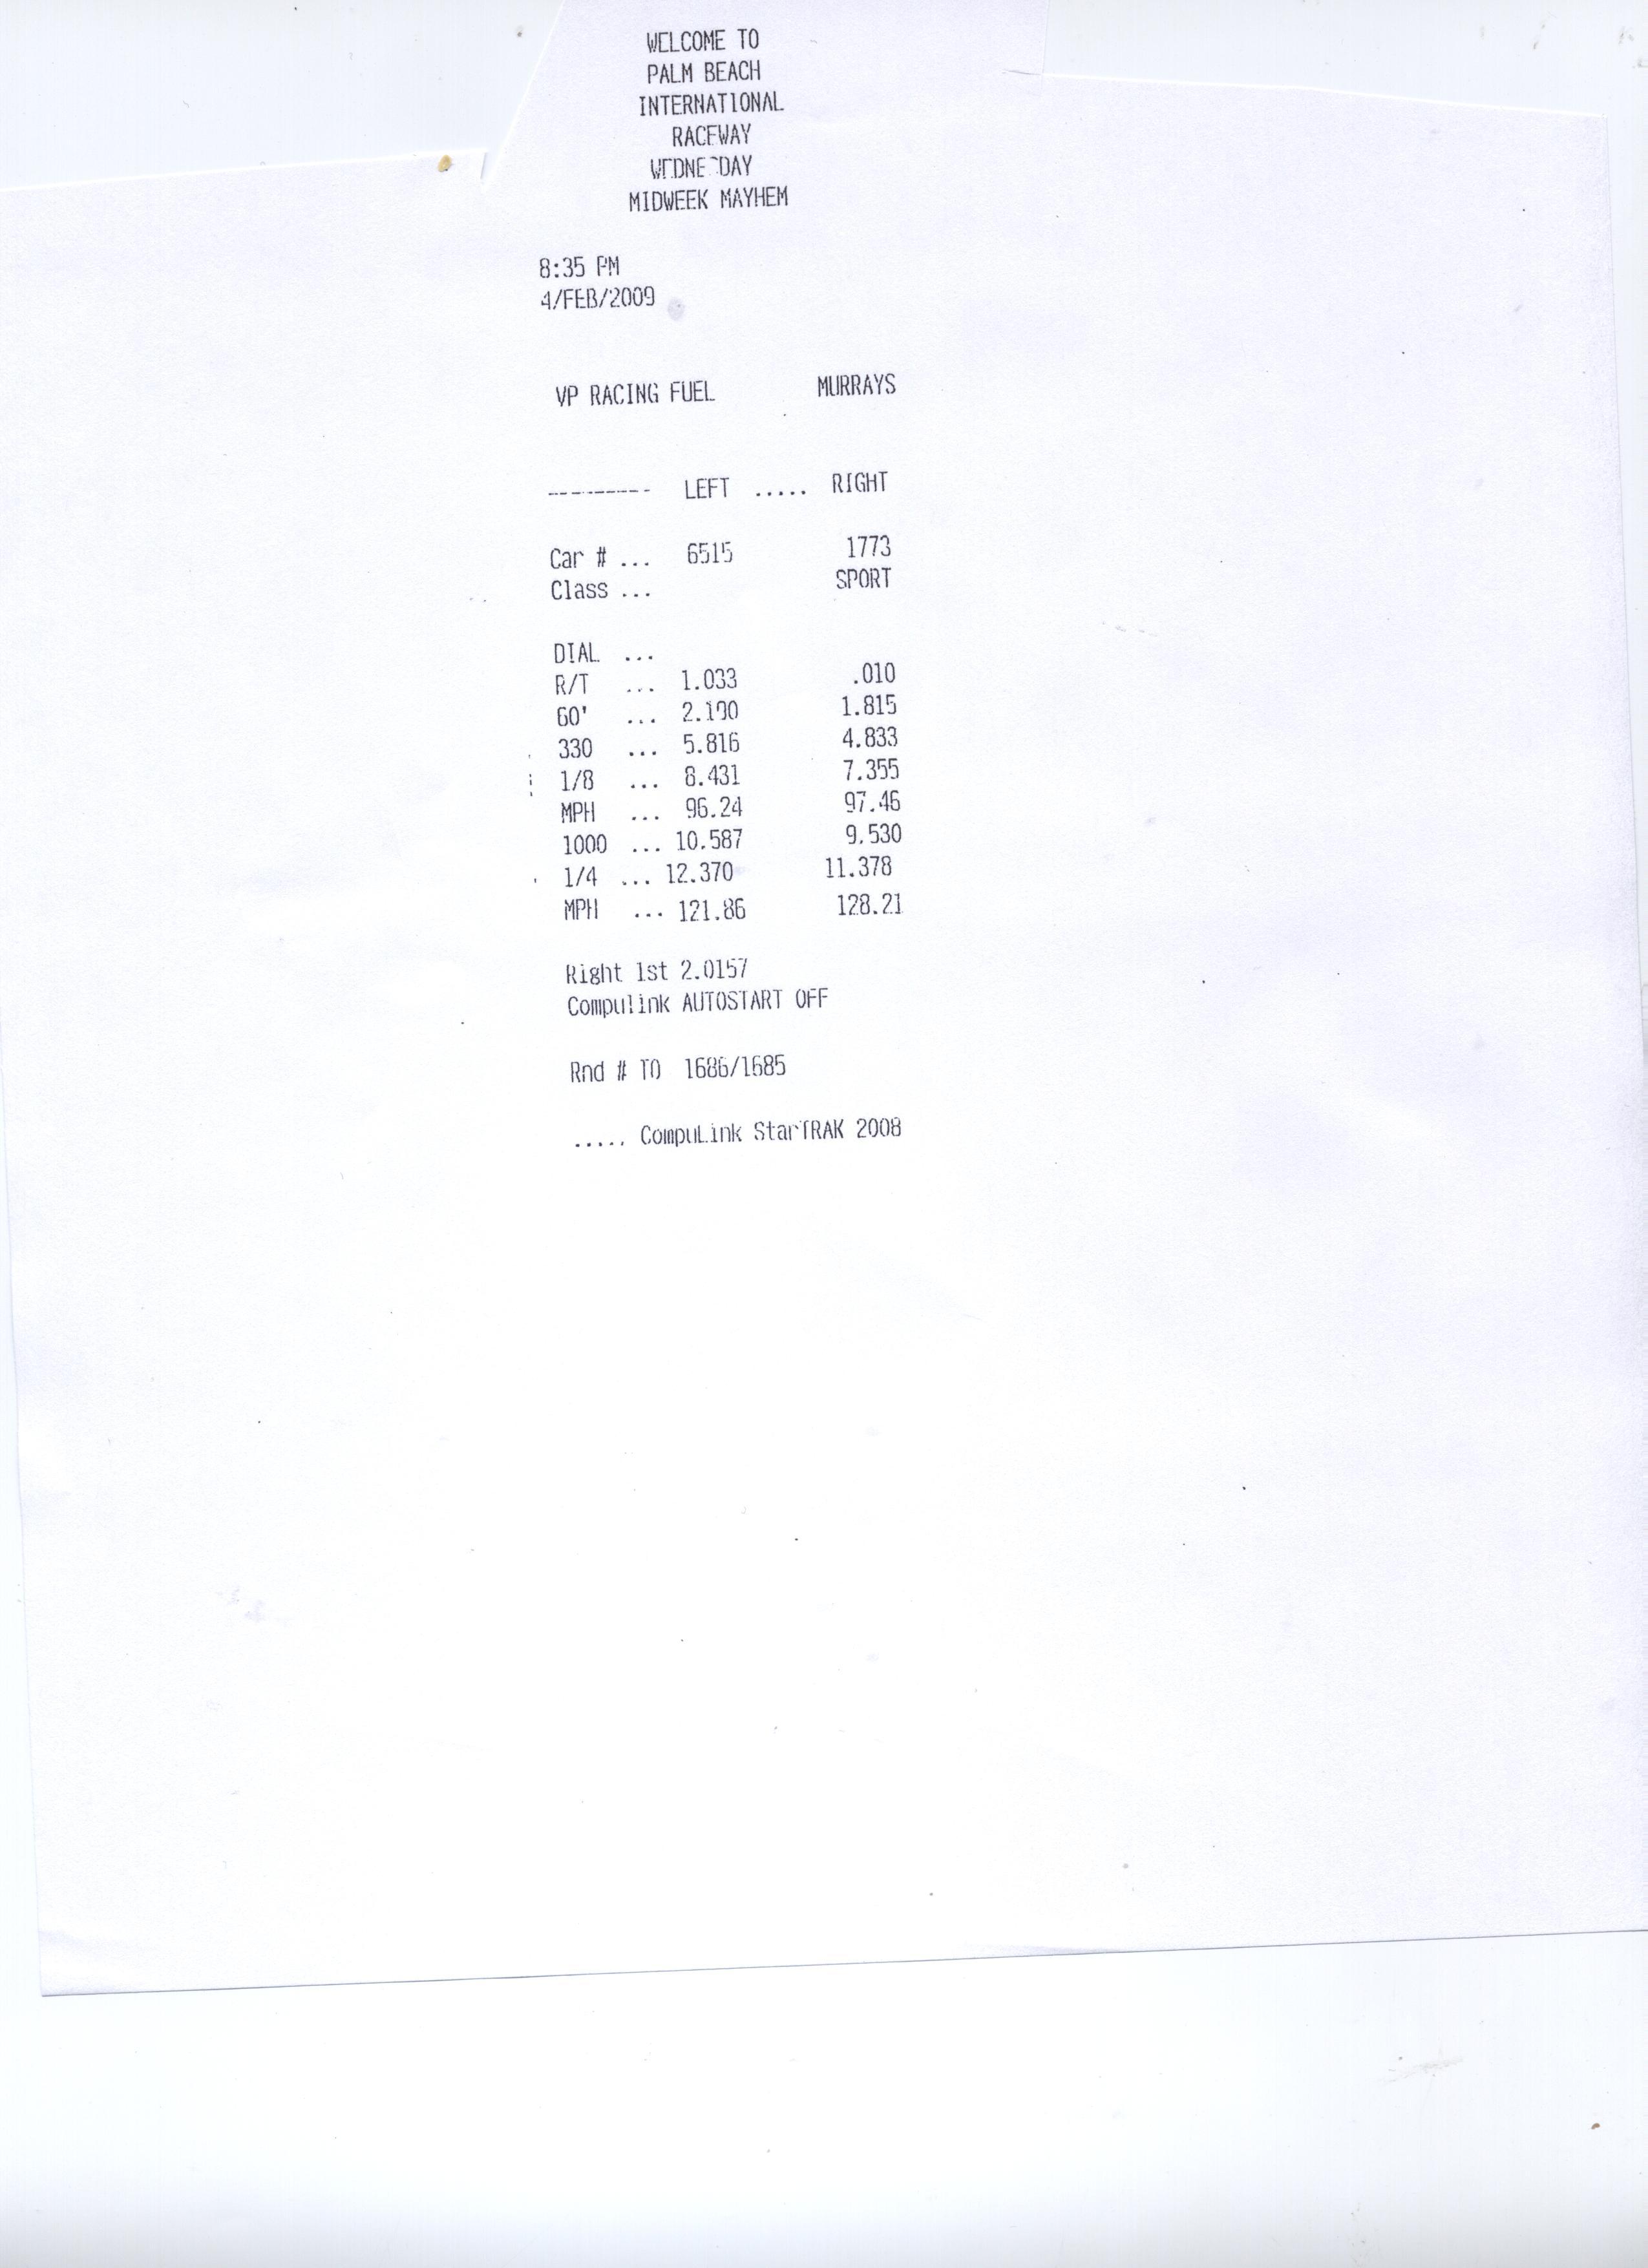 Nissan 350Z Timeslip Scan